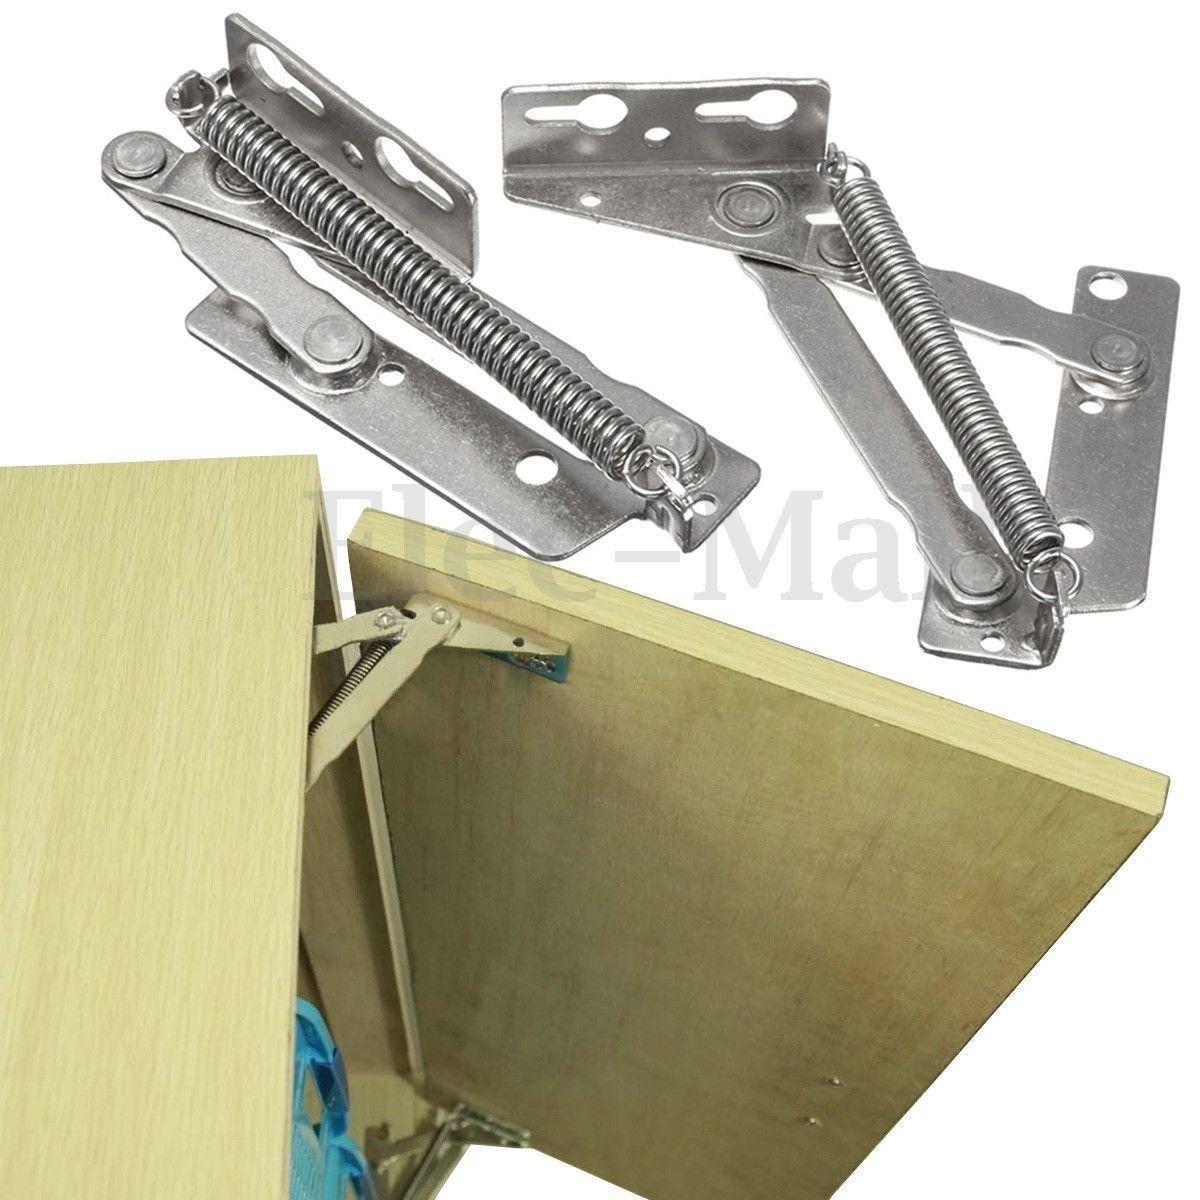 2x Cabinet Cupboard Closet Door Lift Up Stay Flap Top Support 80